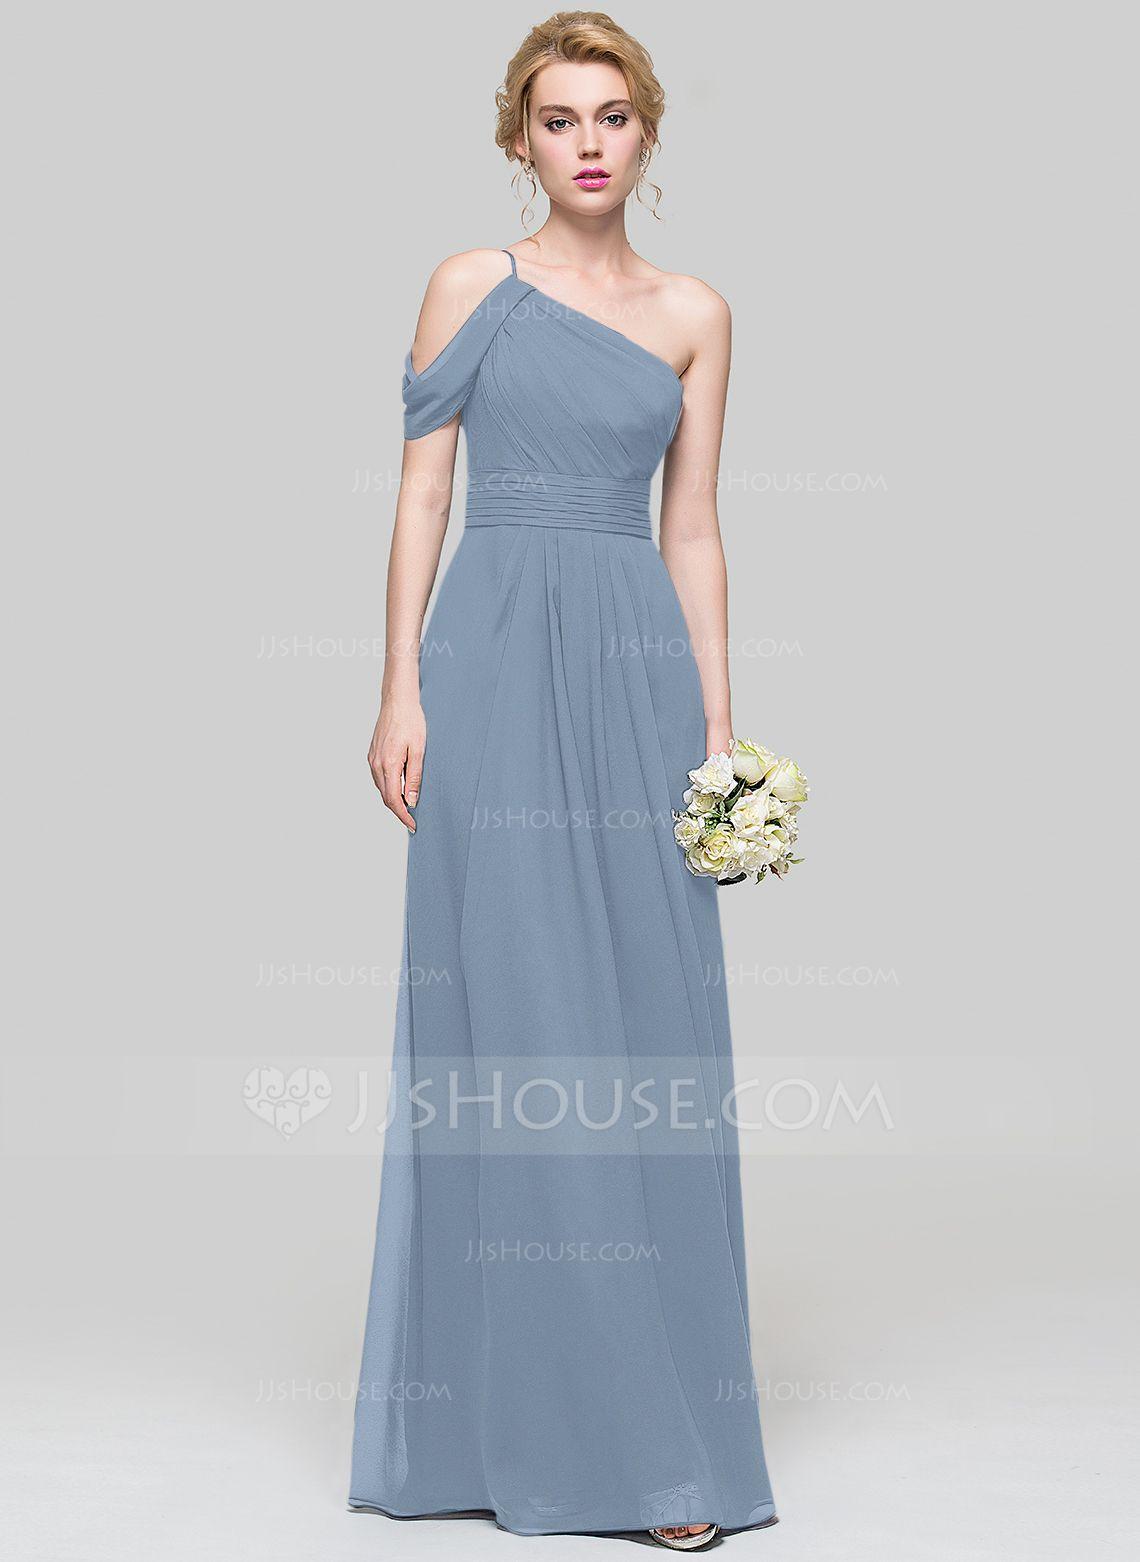 3f1ee532f3e A-Line Princess One-Shoulder Floor-Length Chiffon Bridesmaid Dress With  Ruffle (007090199) - JJsHouse